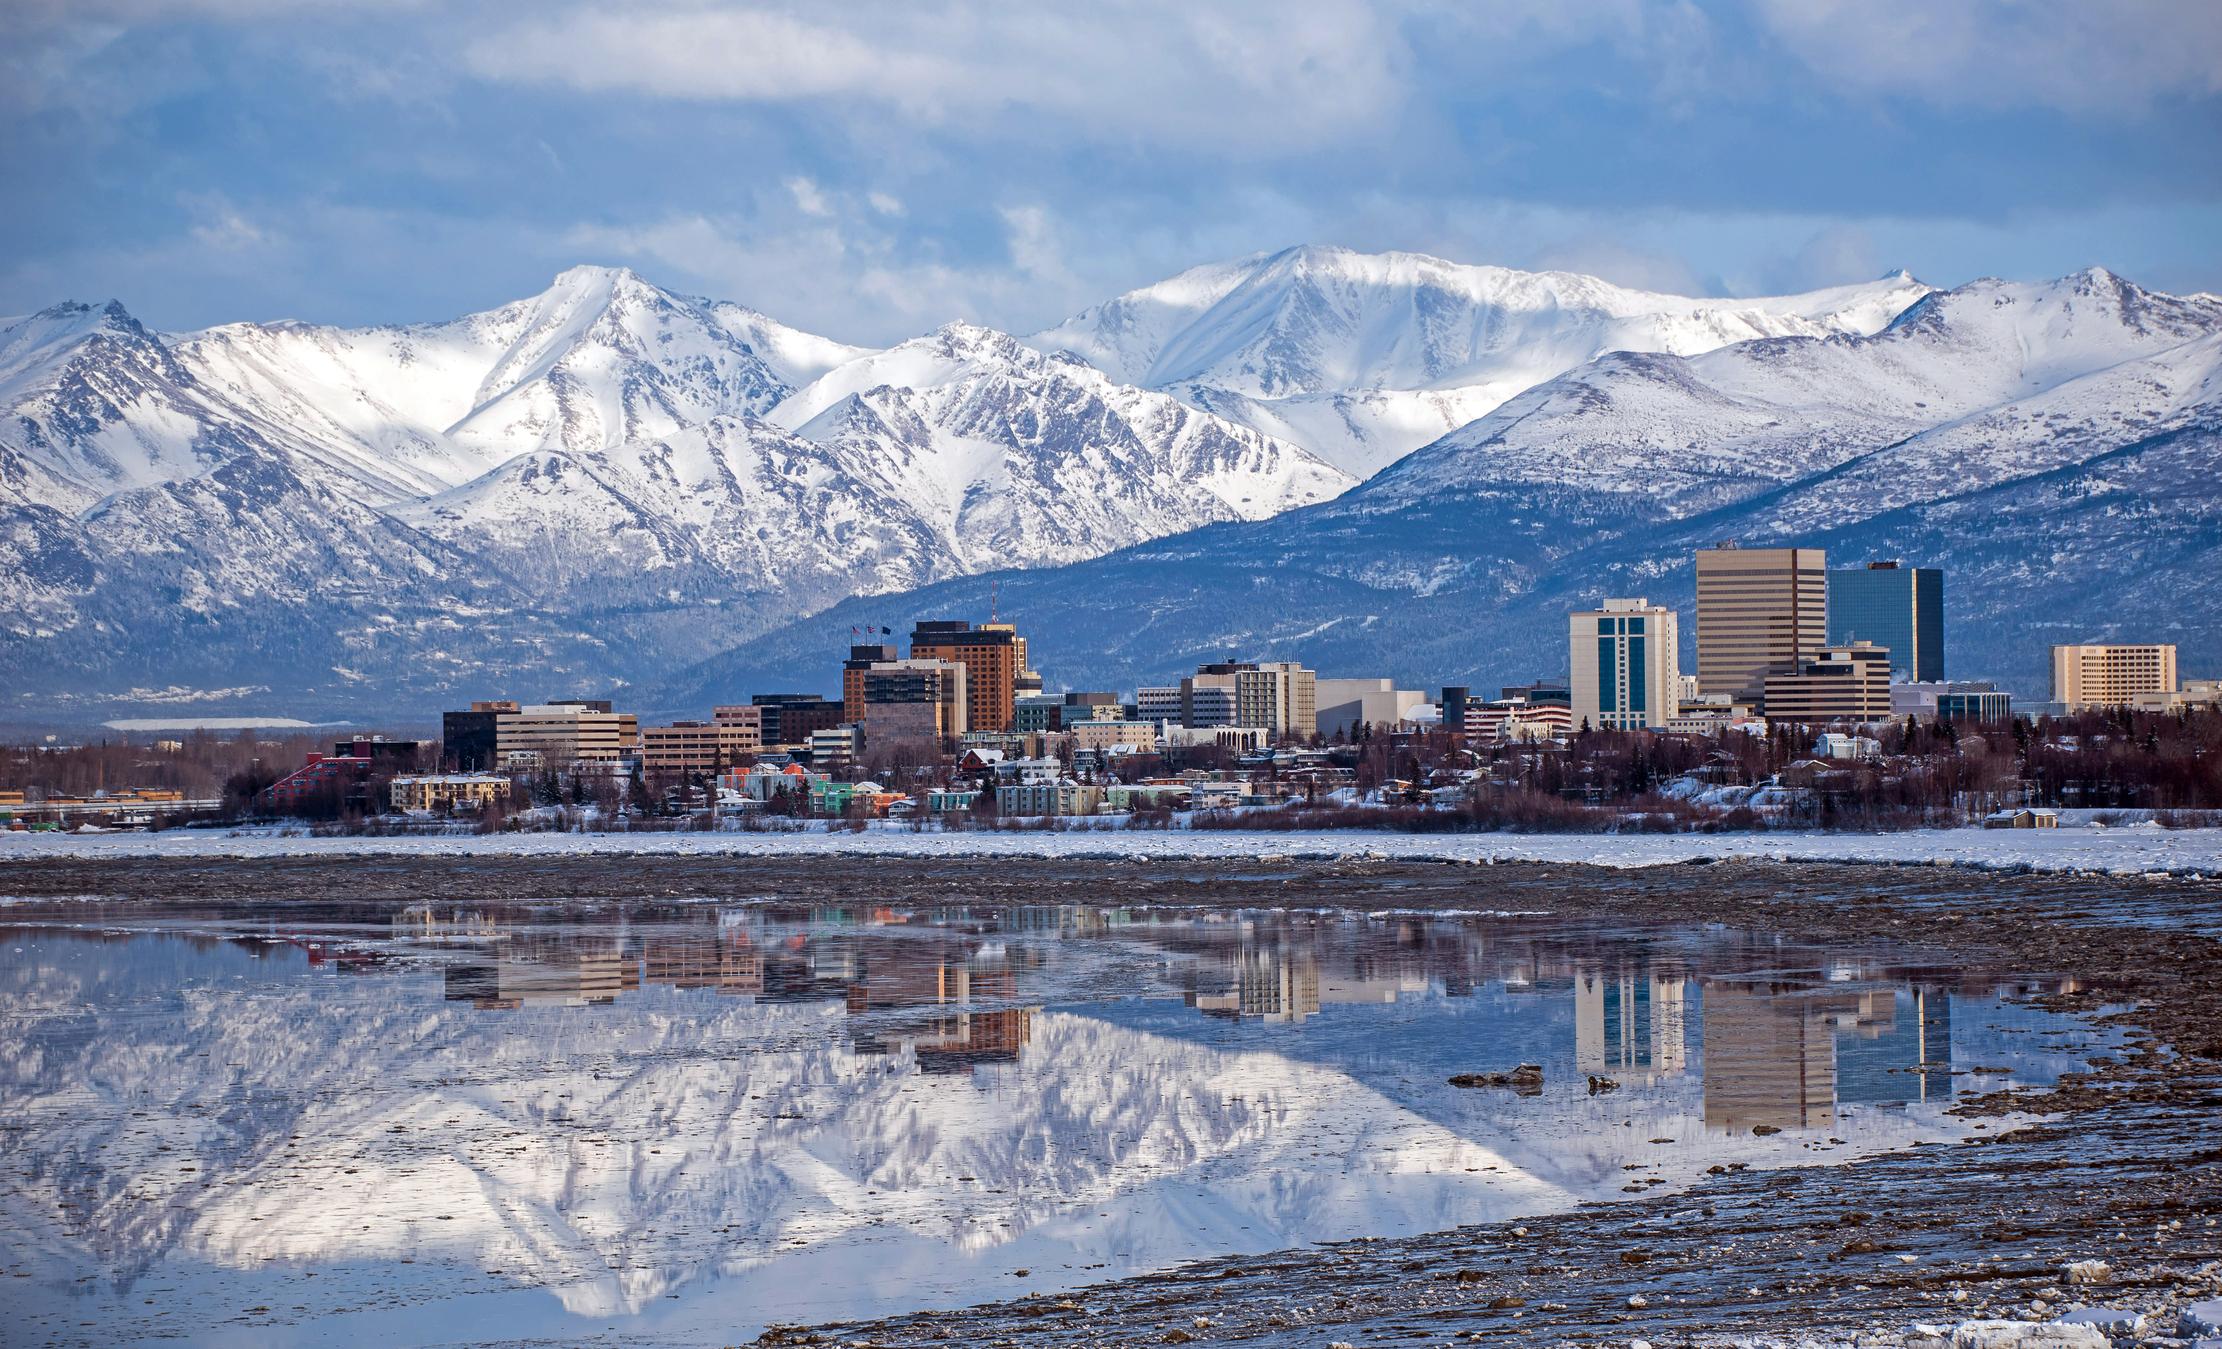 Anchorage, Alaska Skyline with a winter reflection